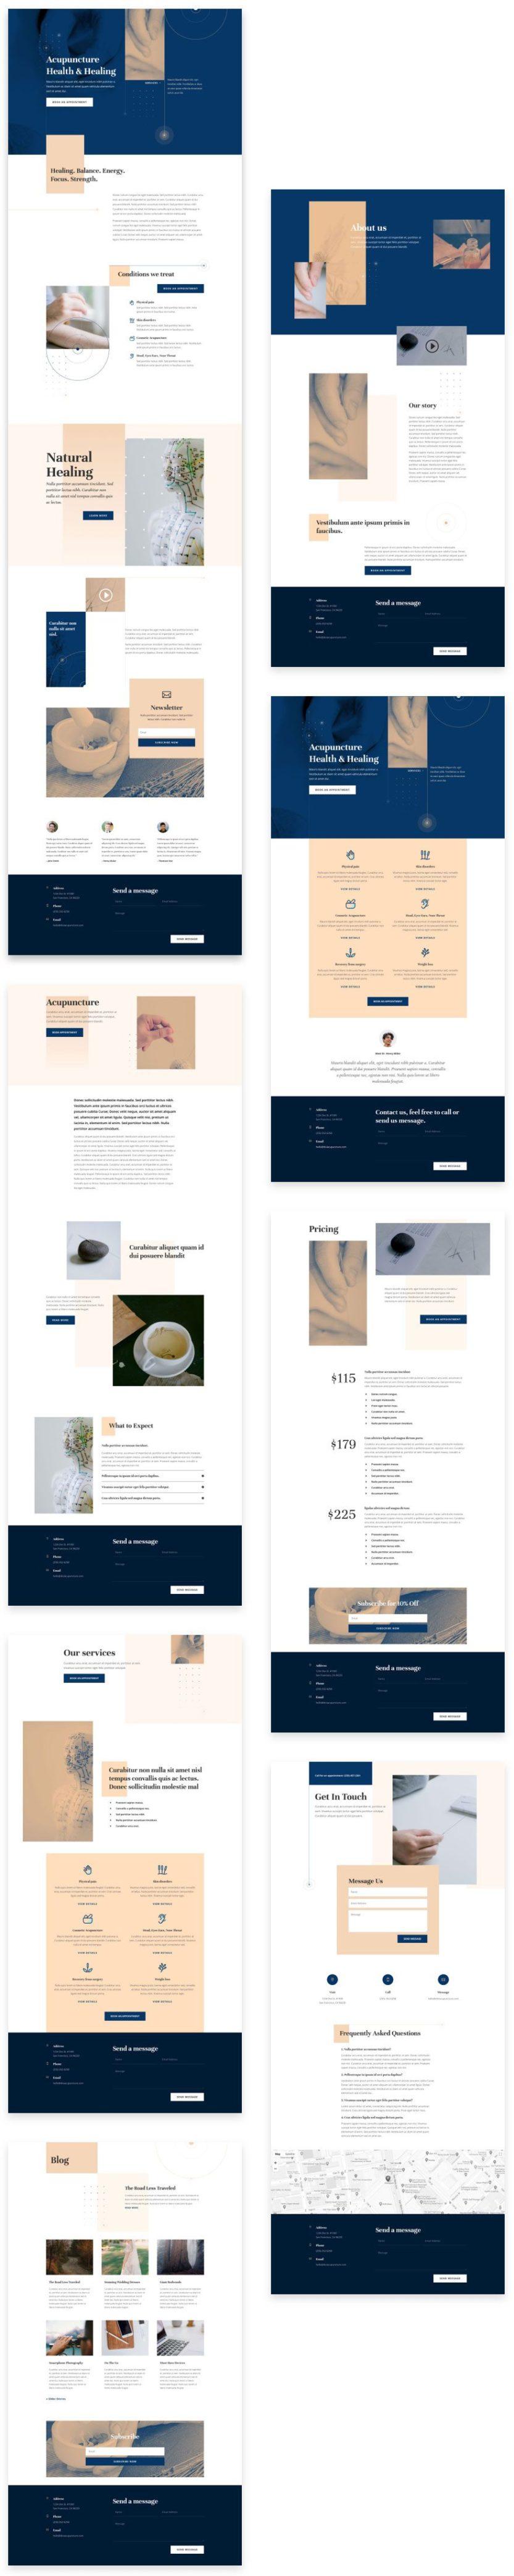 divi acupuncture layout pack